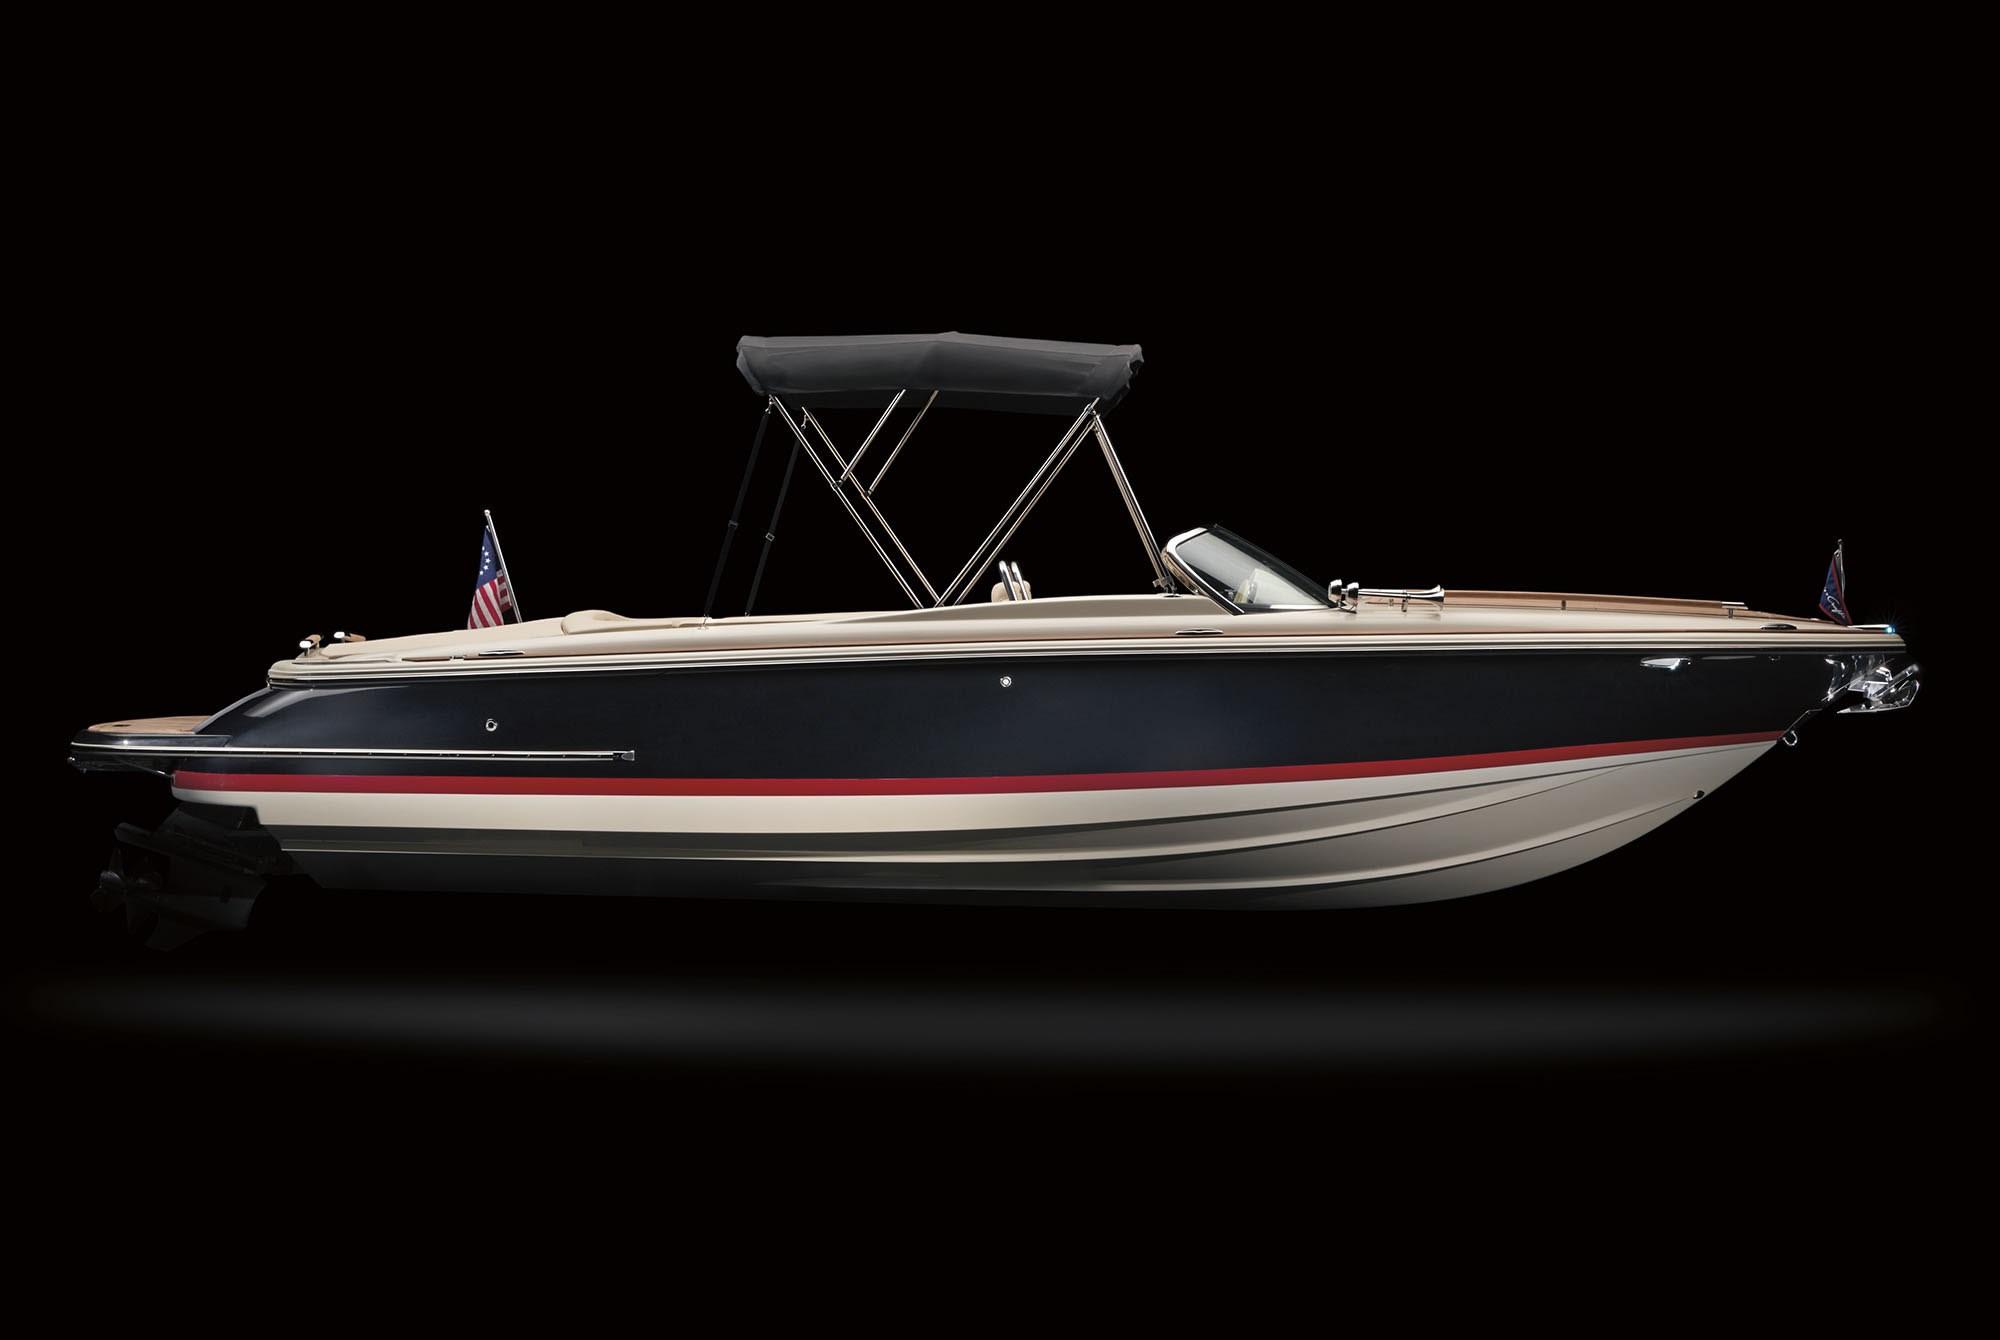 corsair 27 chris craft boats rh chriscraft com Chris Craft Corsair 28 Used Chris Craft Launch 25